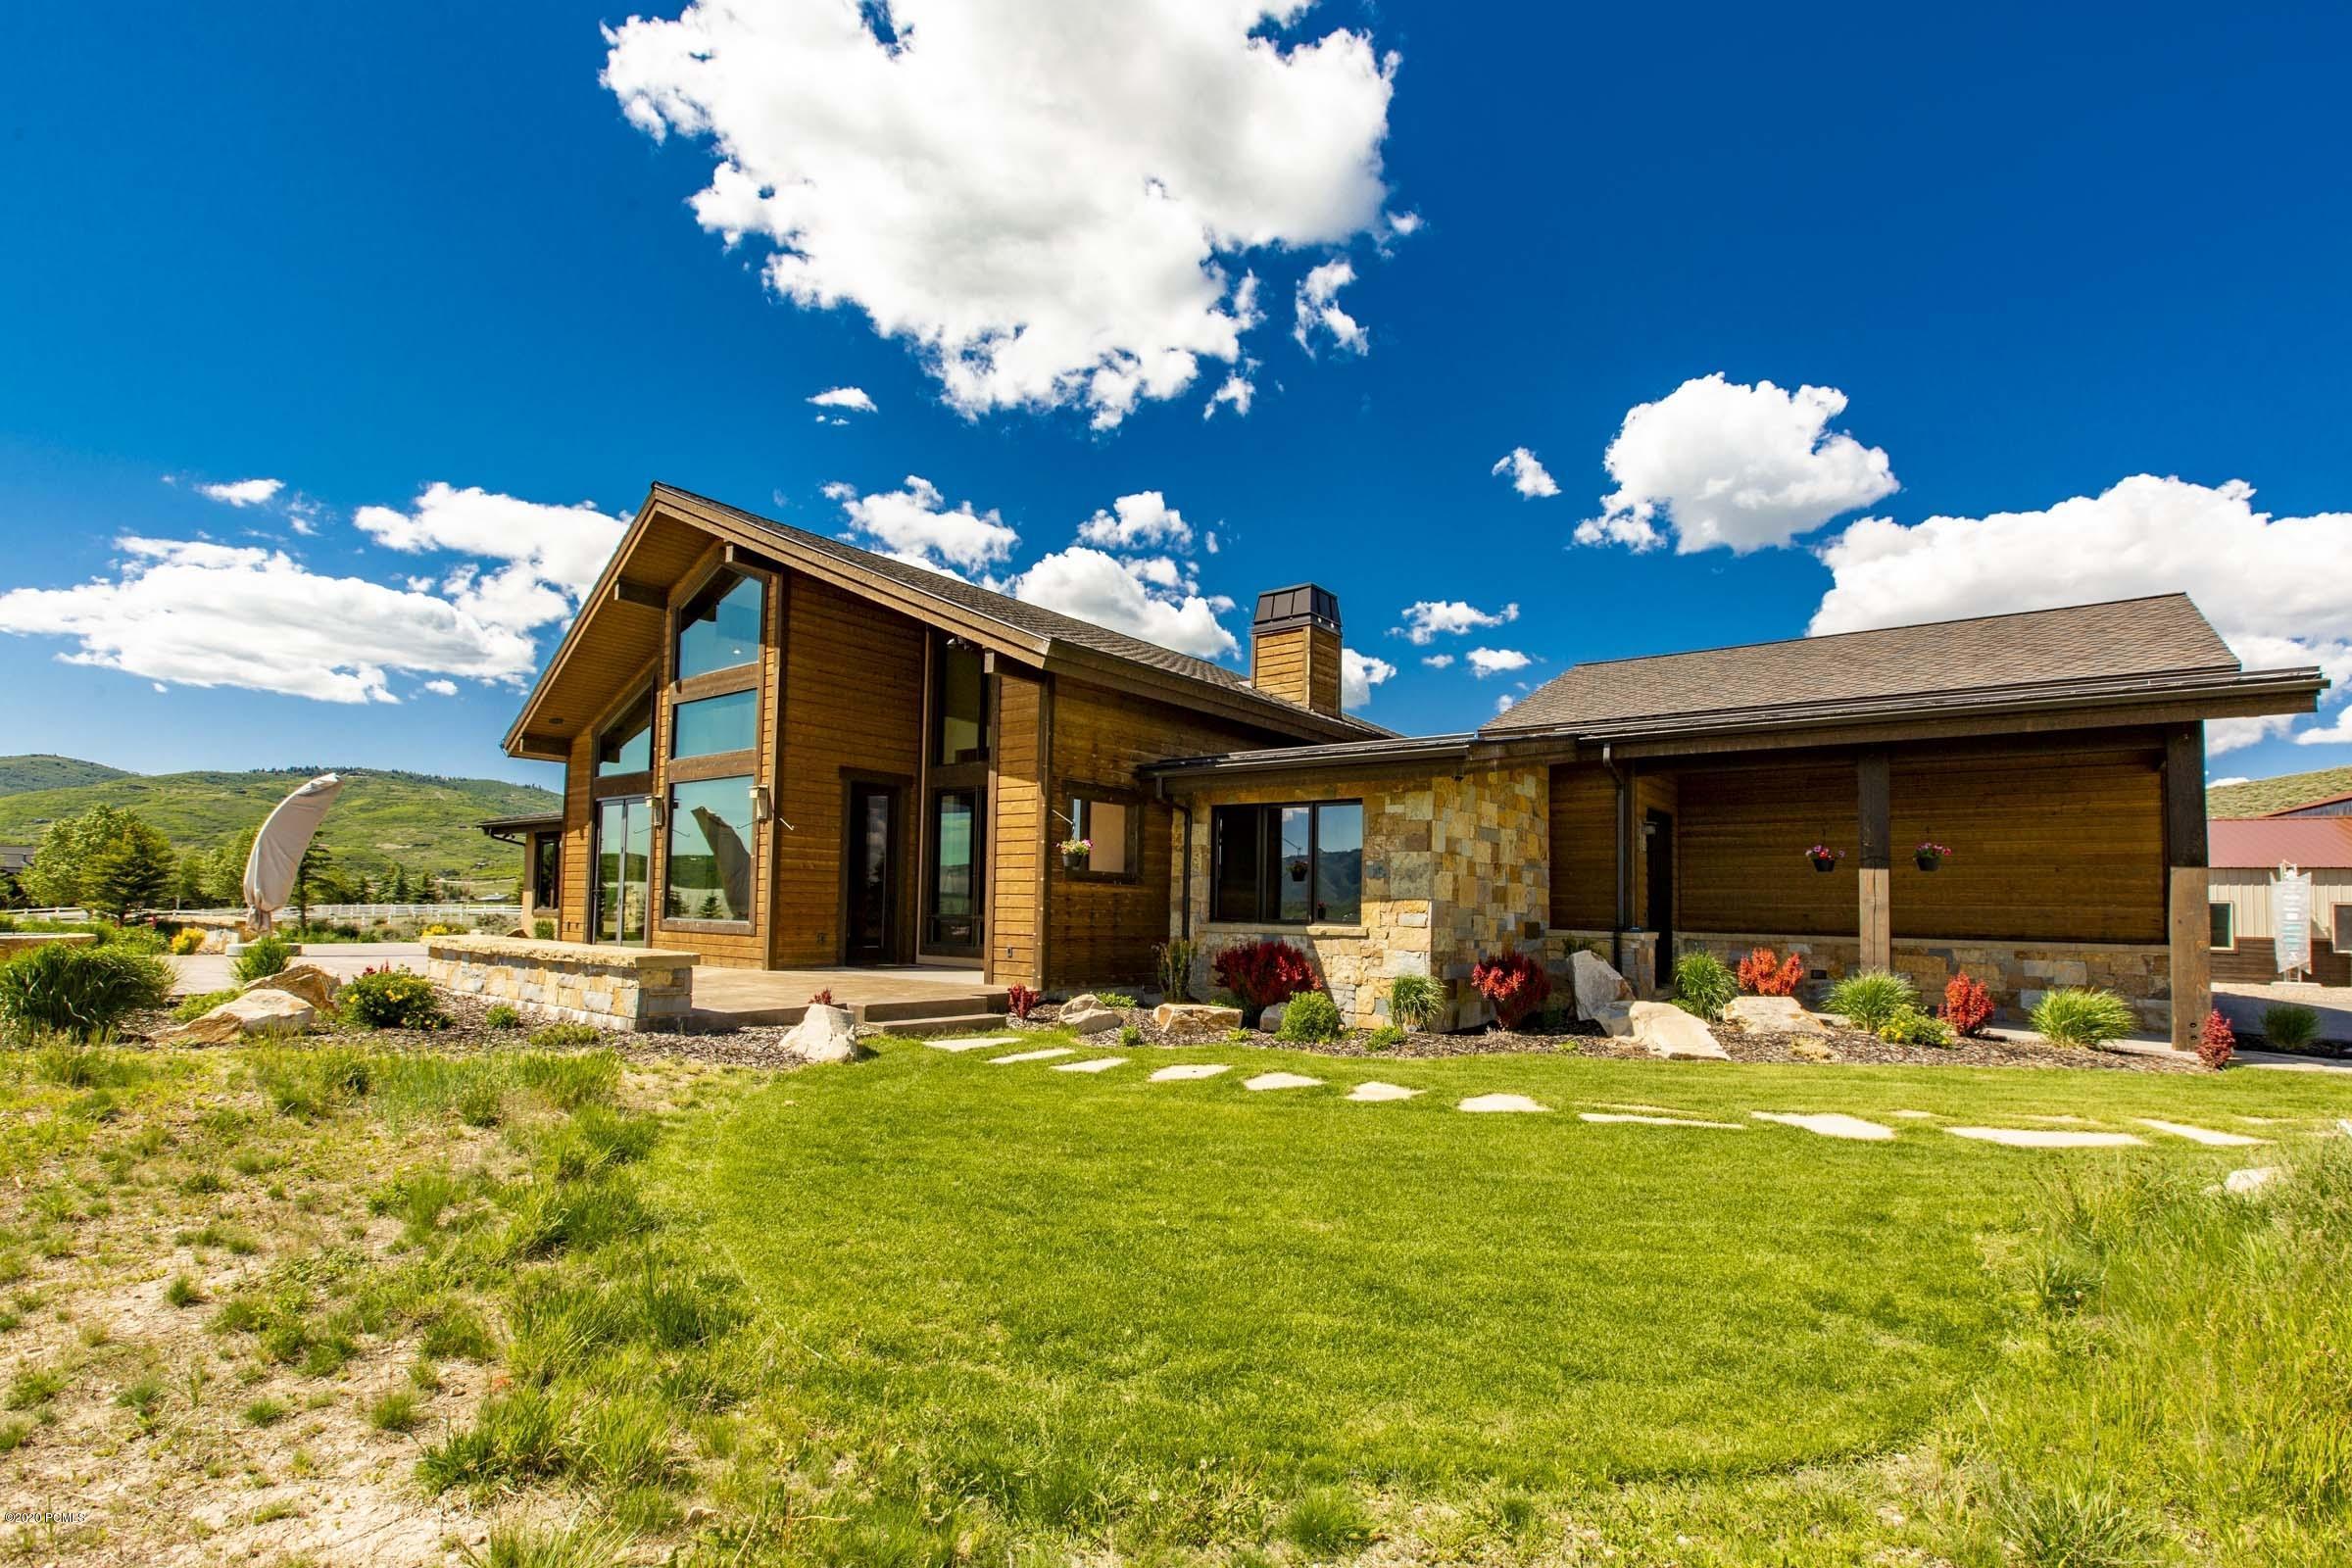 8449 Silver Creek Road, Park City, Utah 84098, 5 Bedrooms Bedrooms, ,5 BathroomsBathrooms,Single Family,For Sale,Silver Creek,20190109112430415765000000